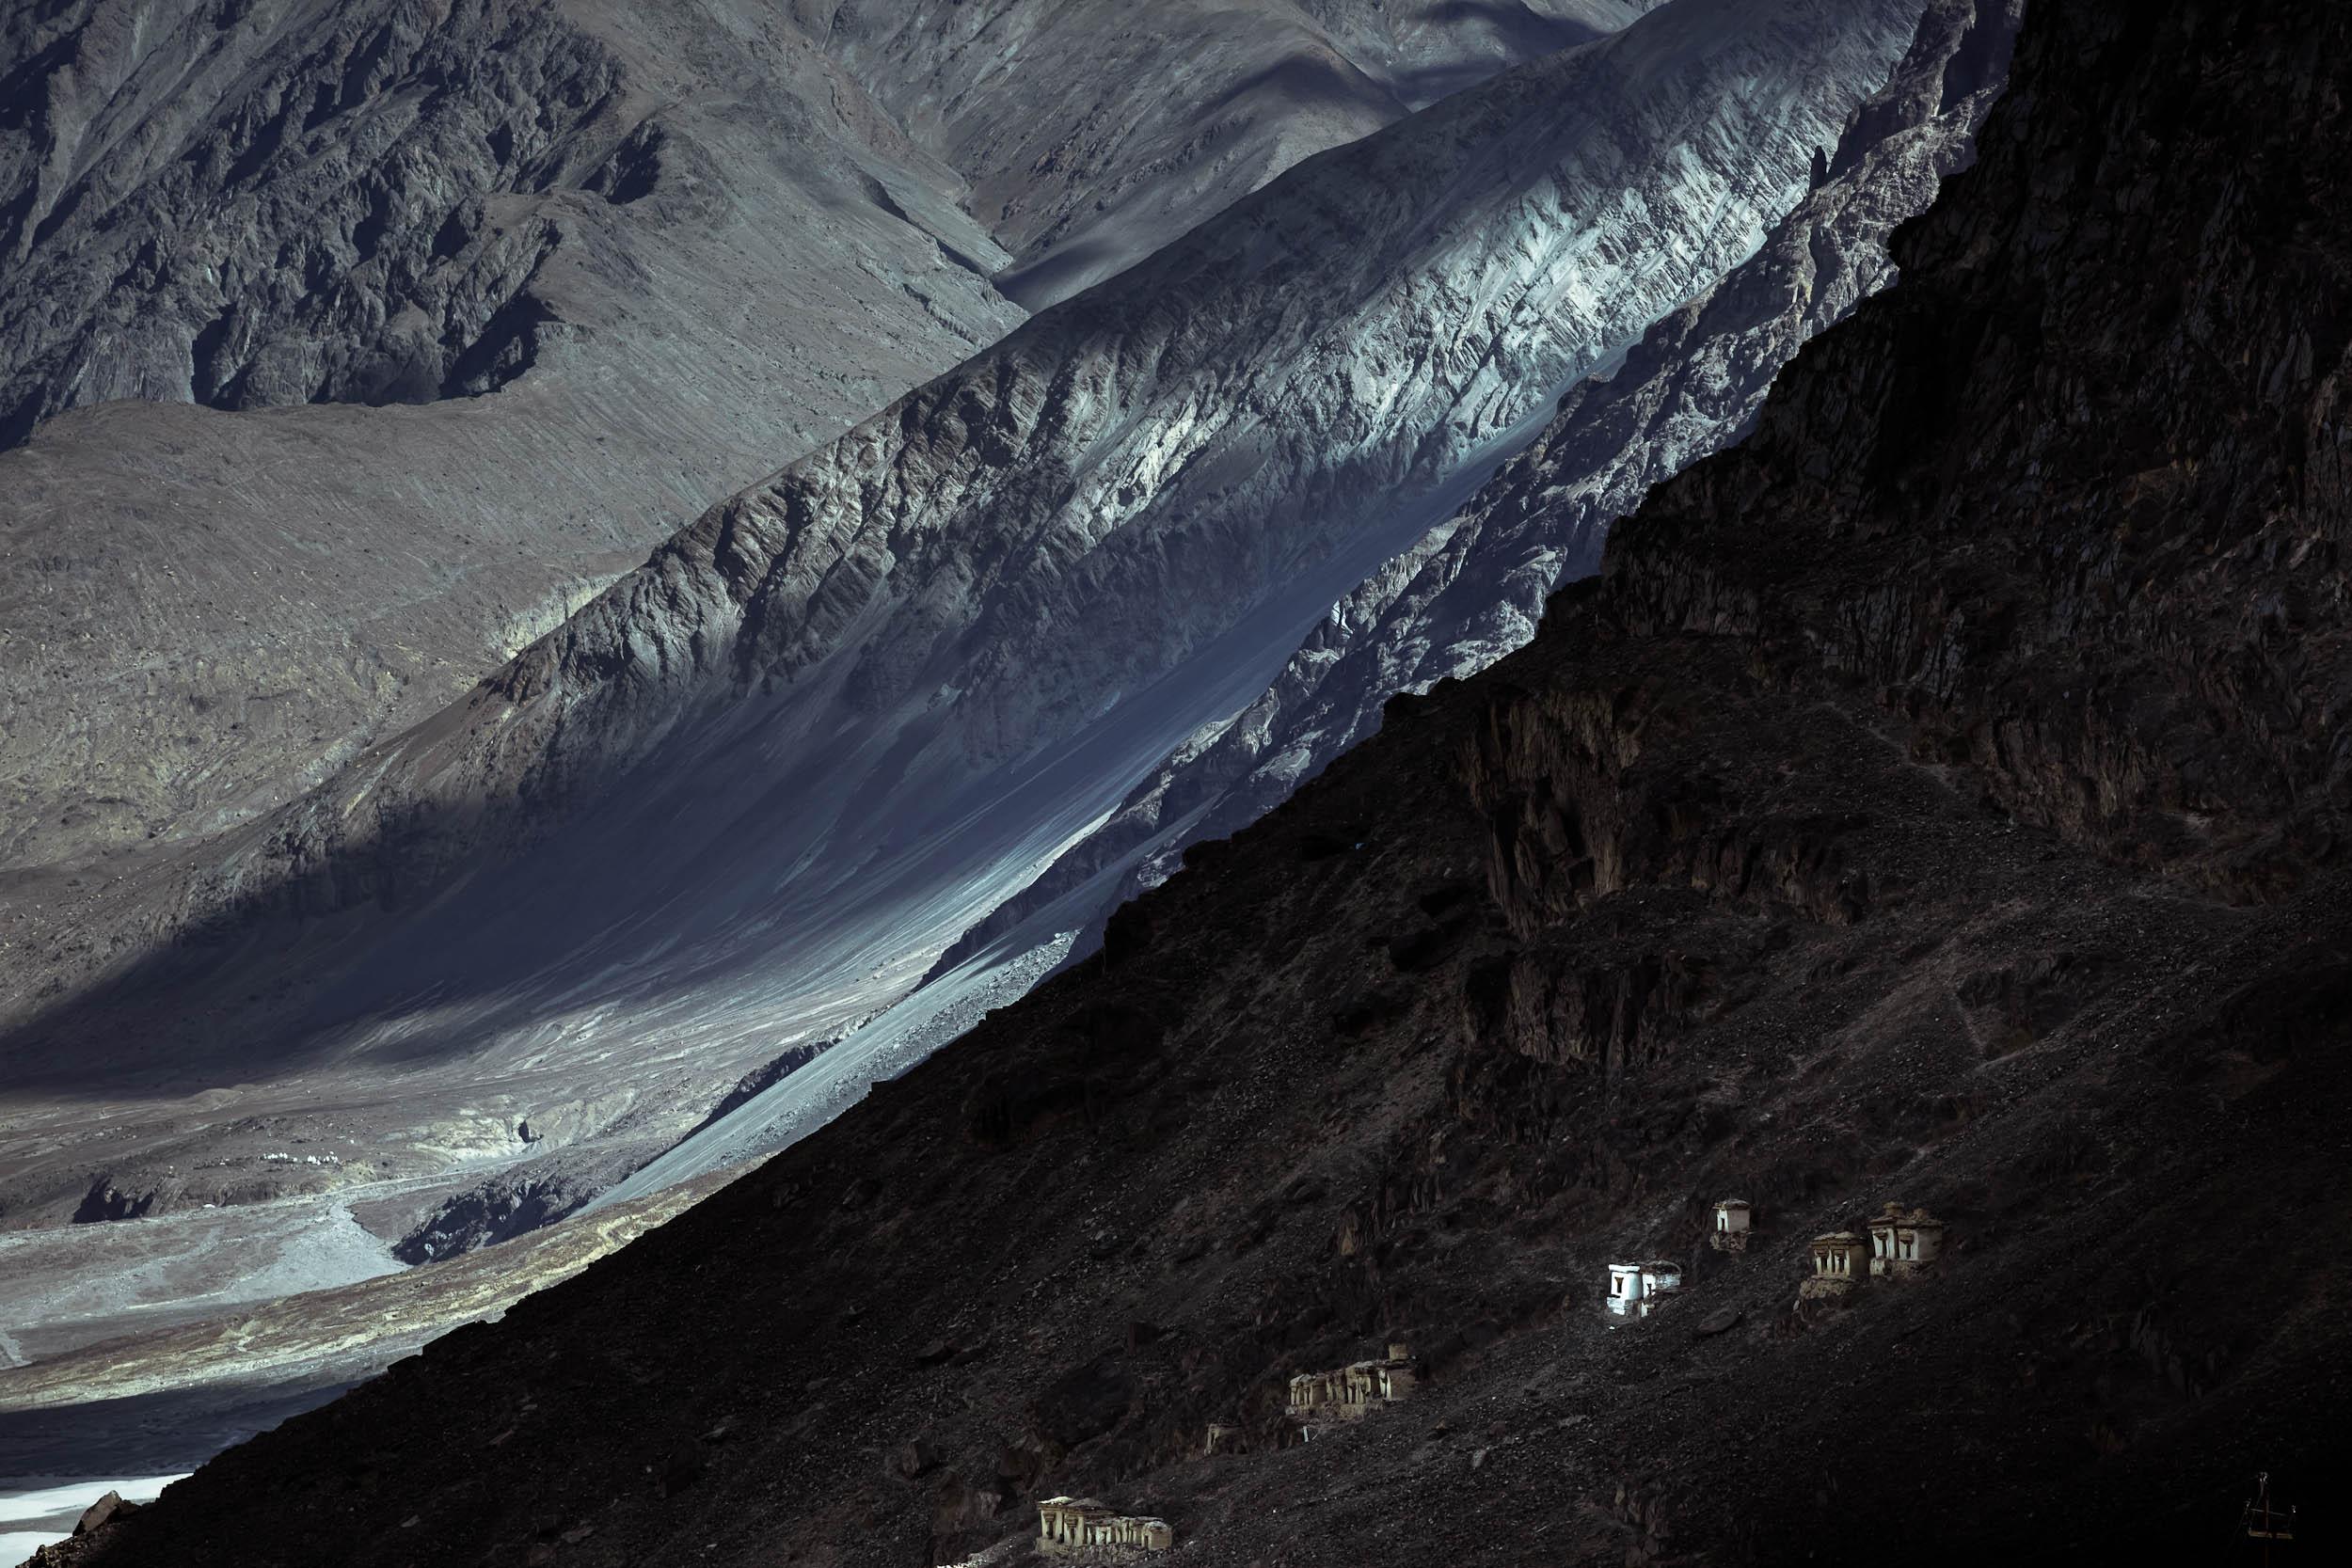 Sindhur_Photography_Travel_Landscape_Ladakh-5.JPG